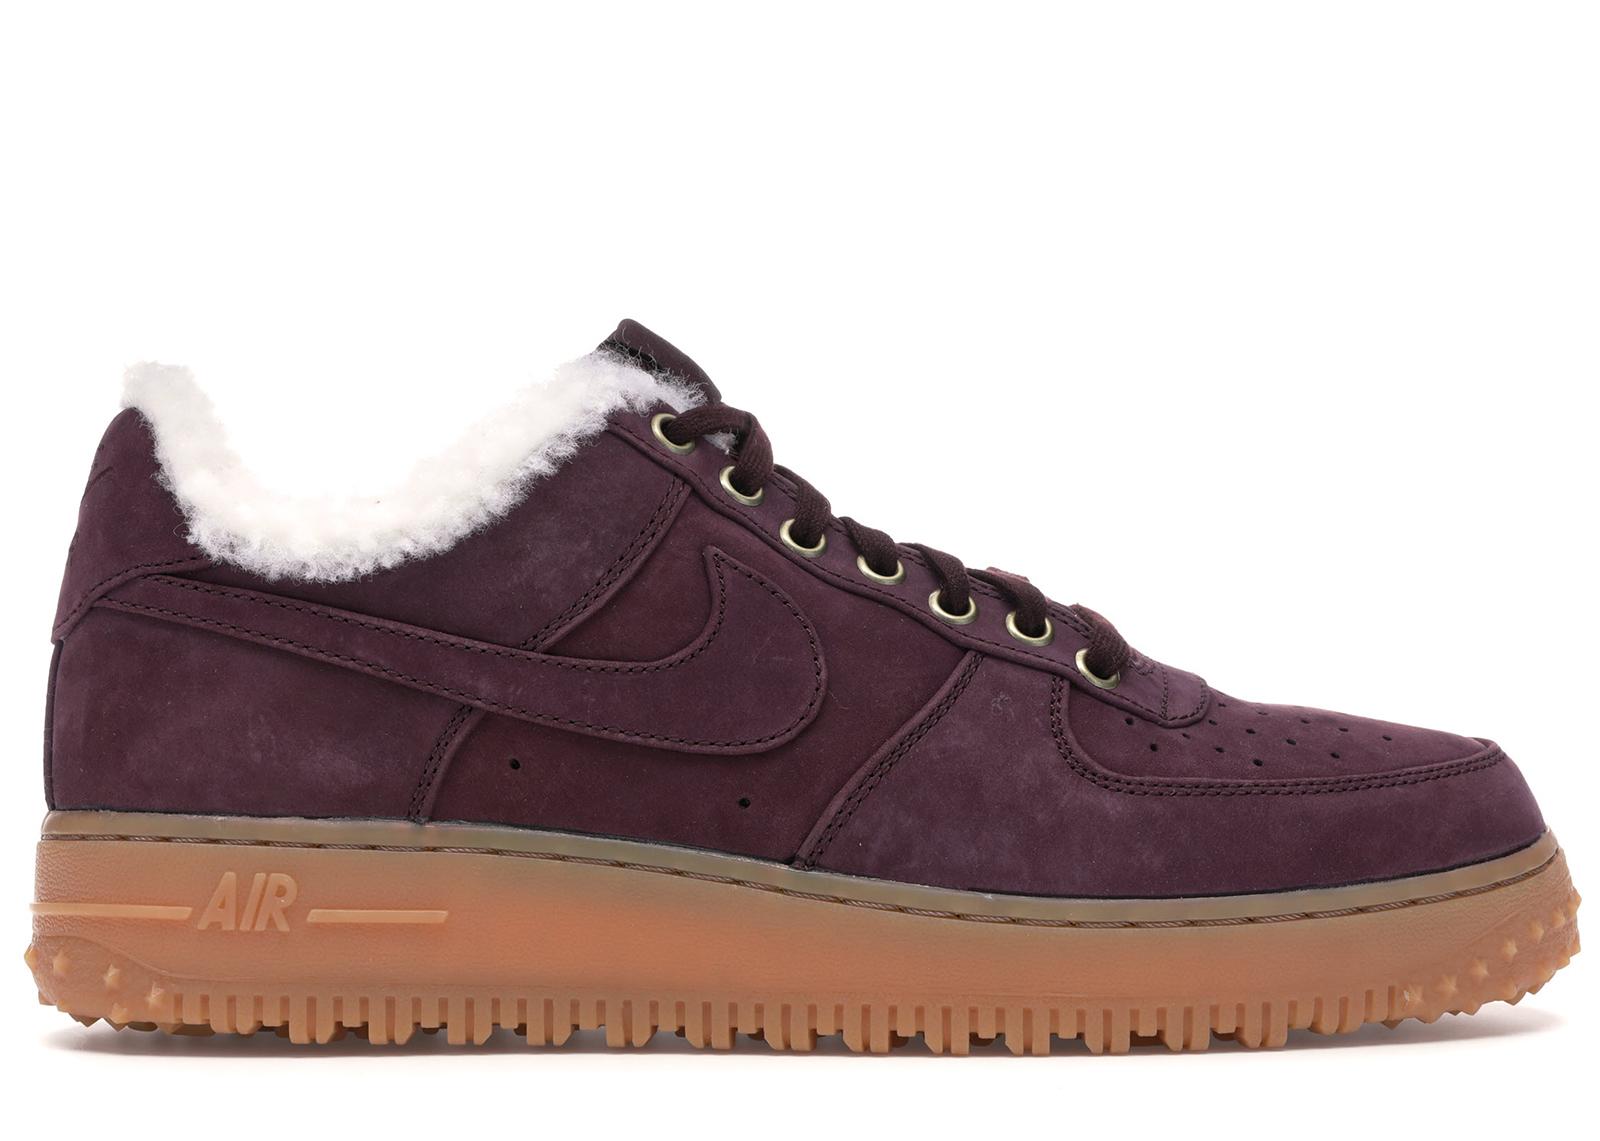 Nike Air Force 1 Winter Burgundy Crush